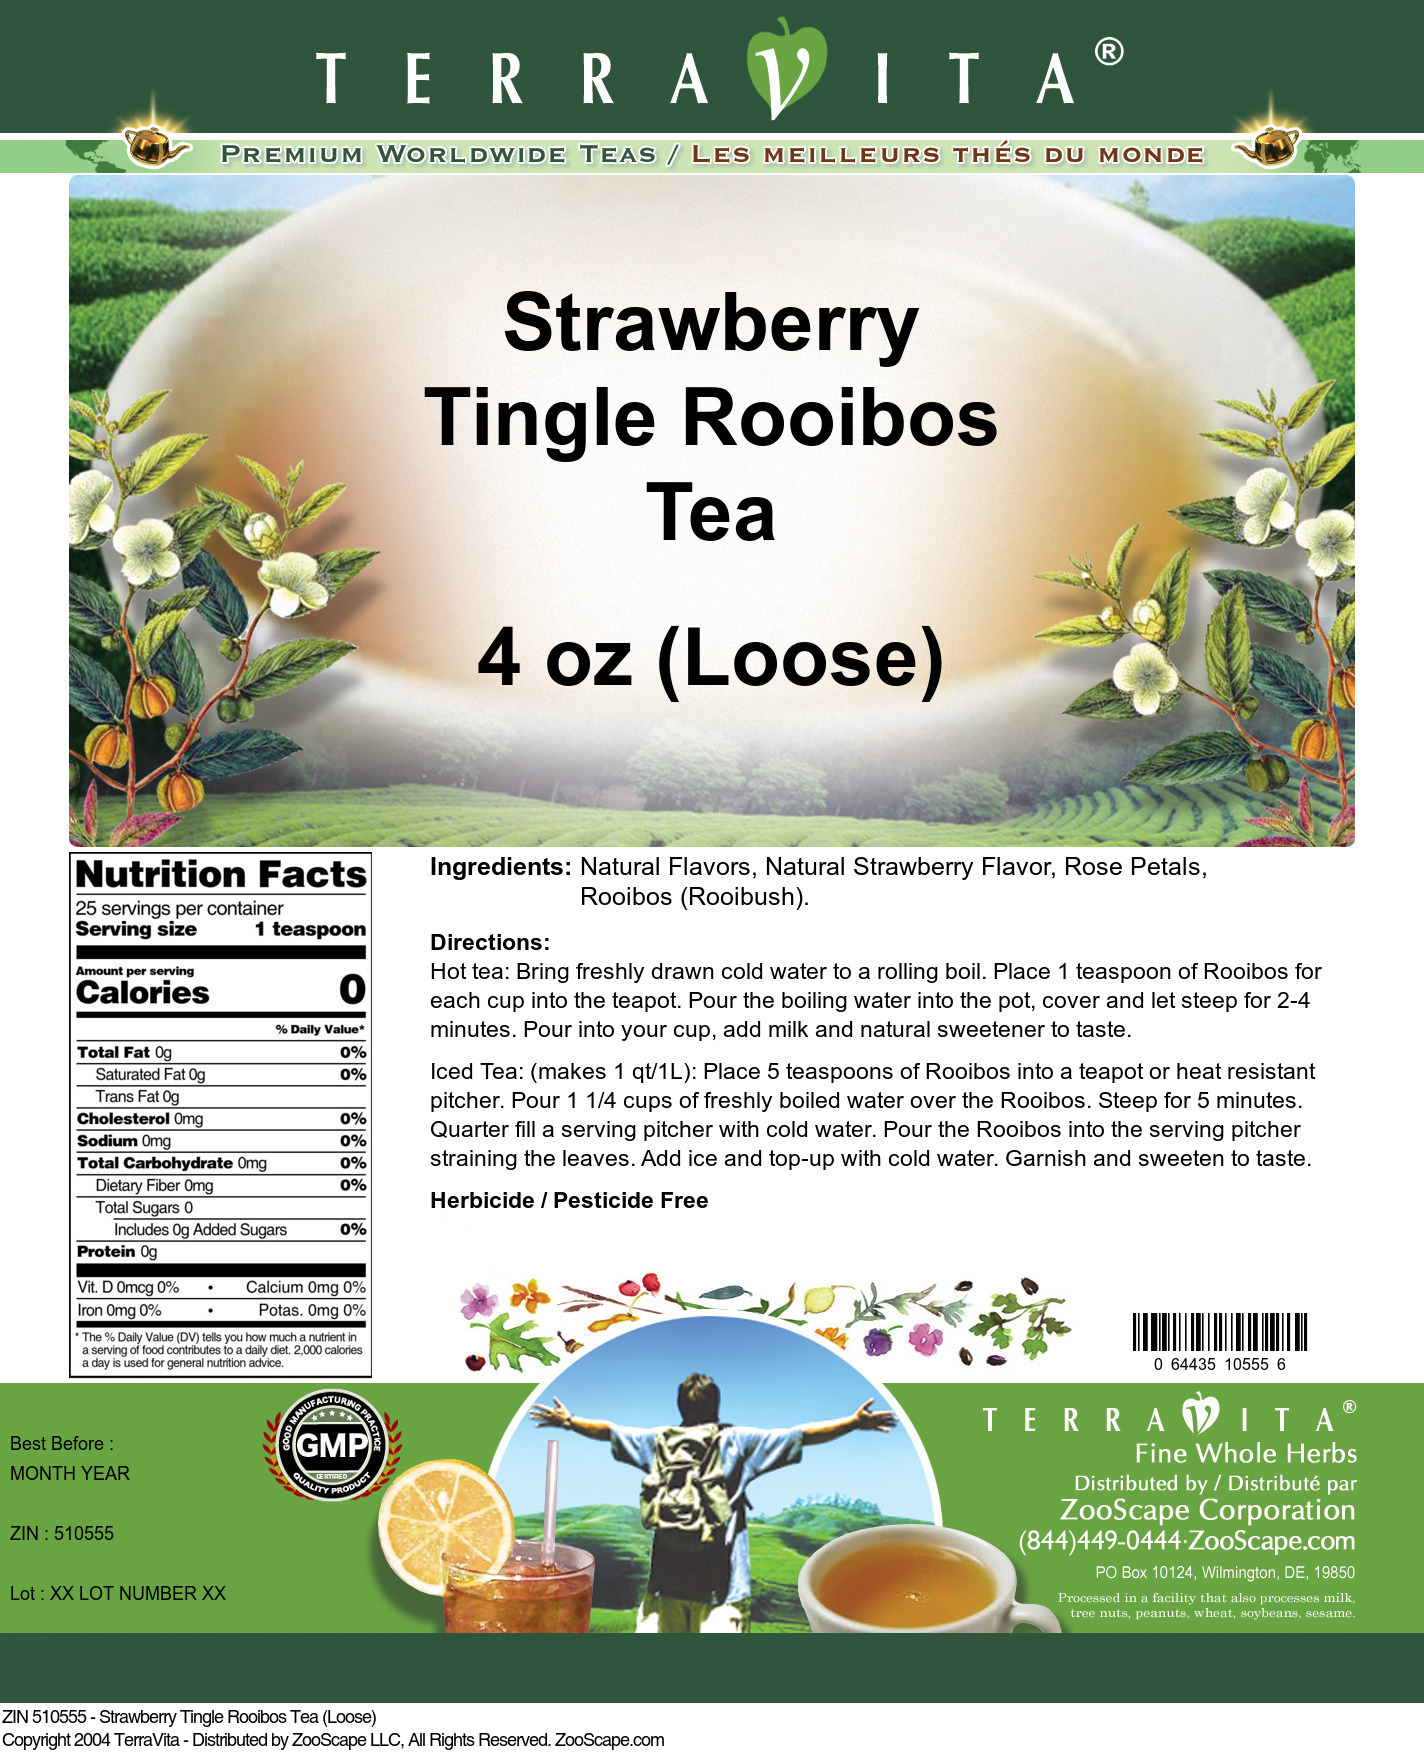 Strawberry Tingle Rooibos Tea